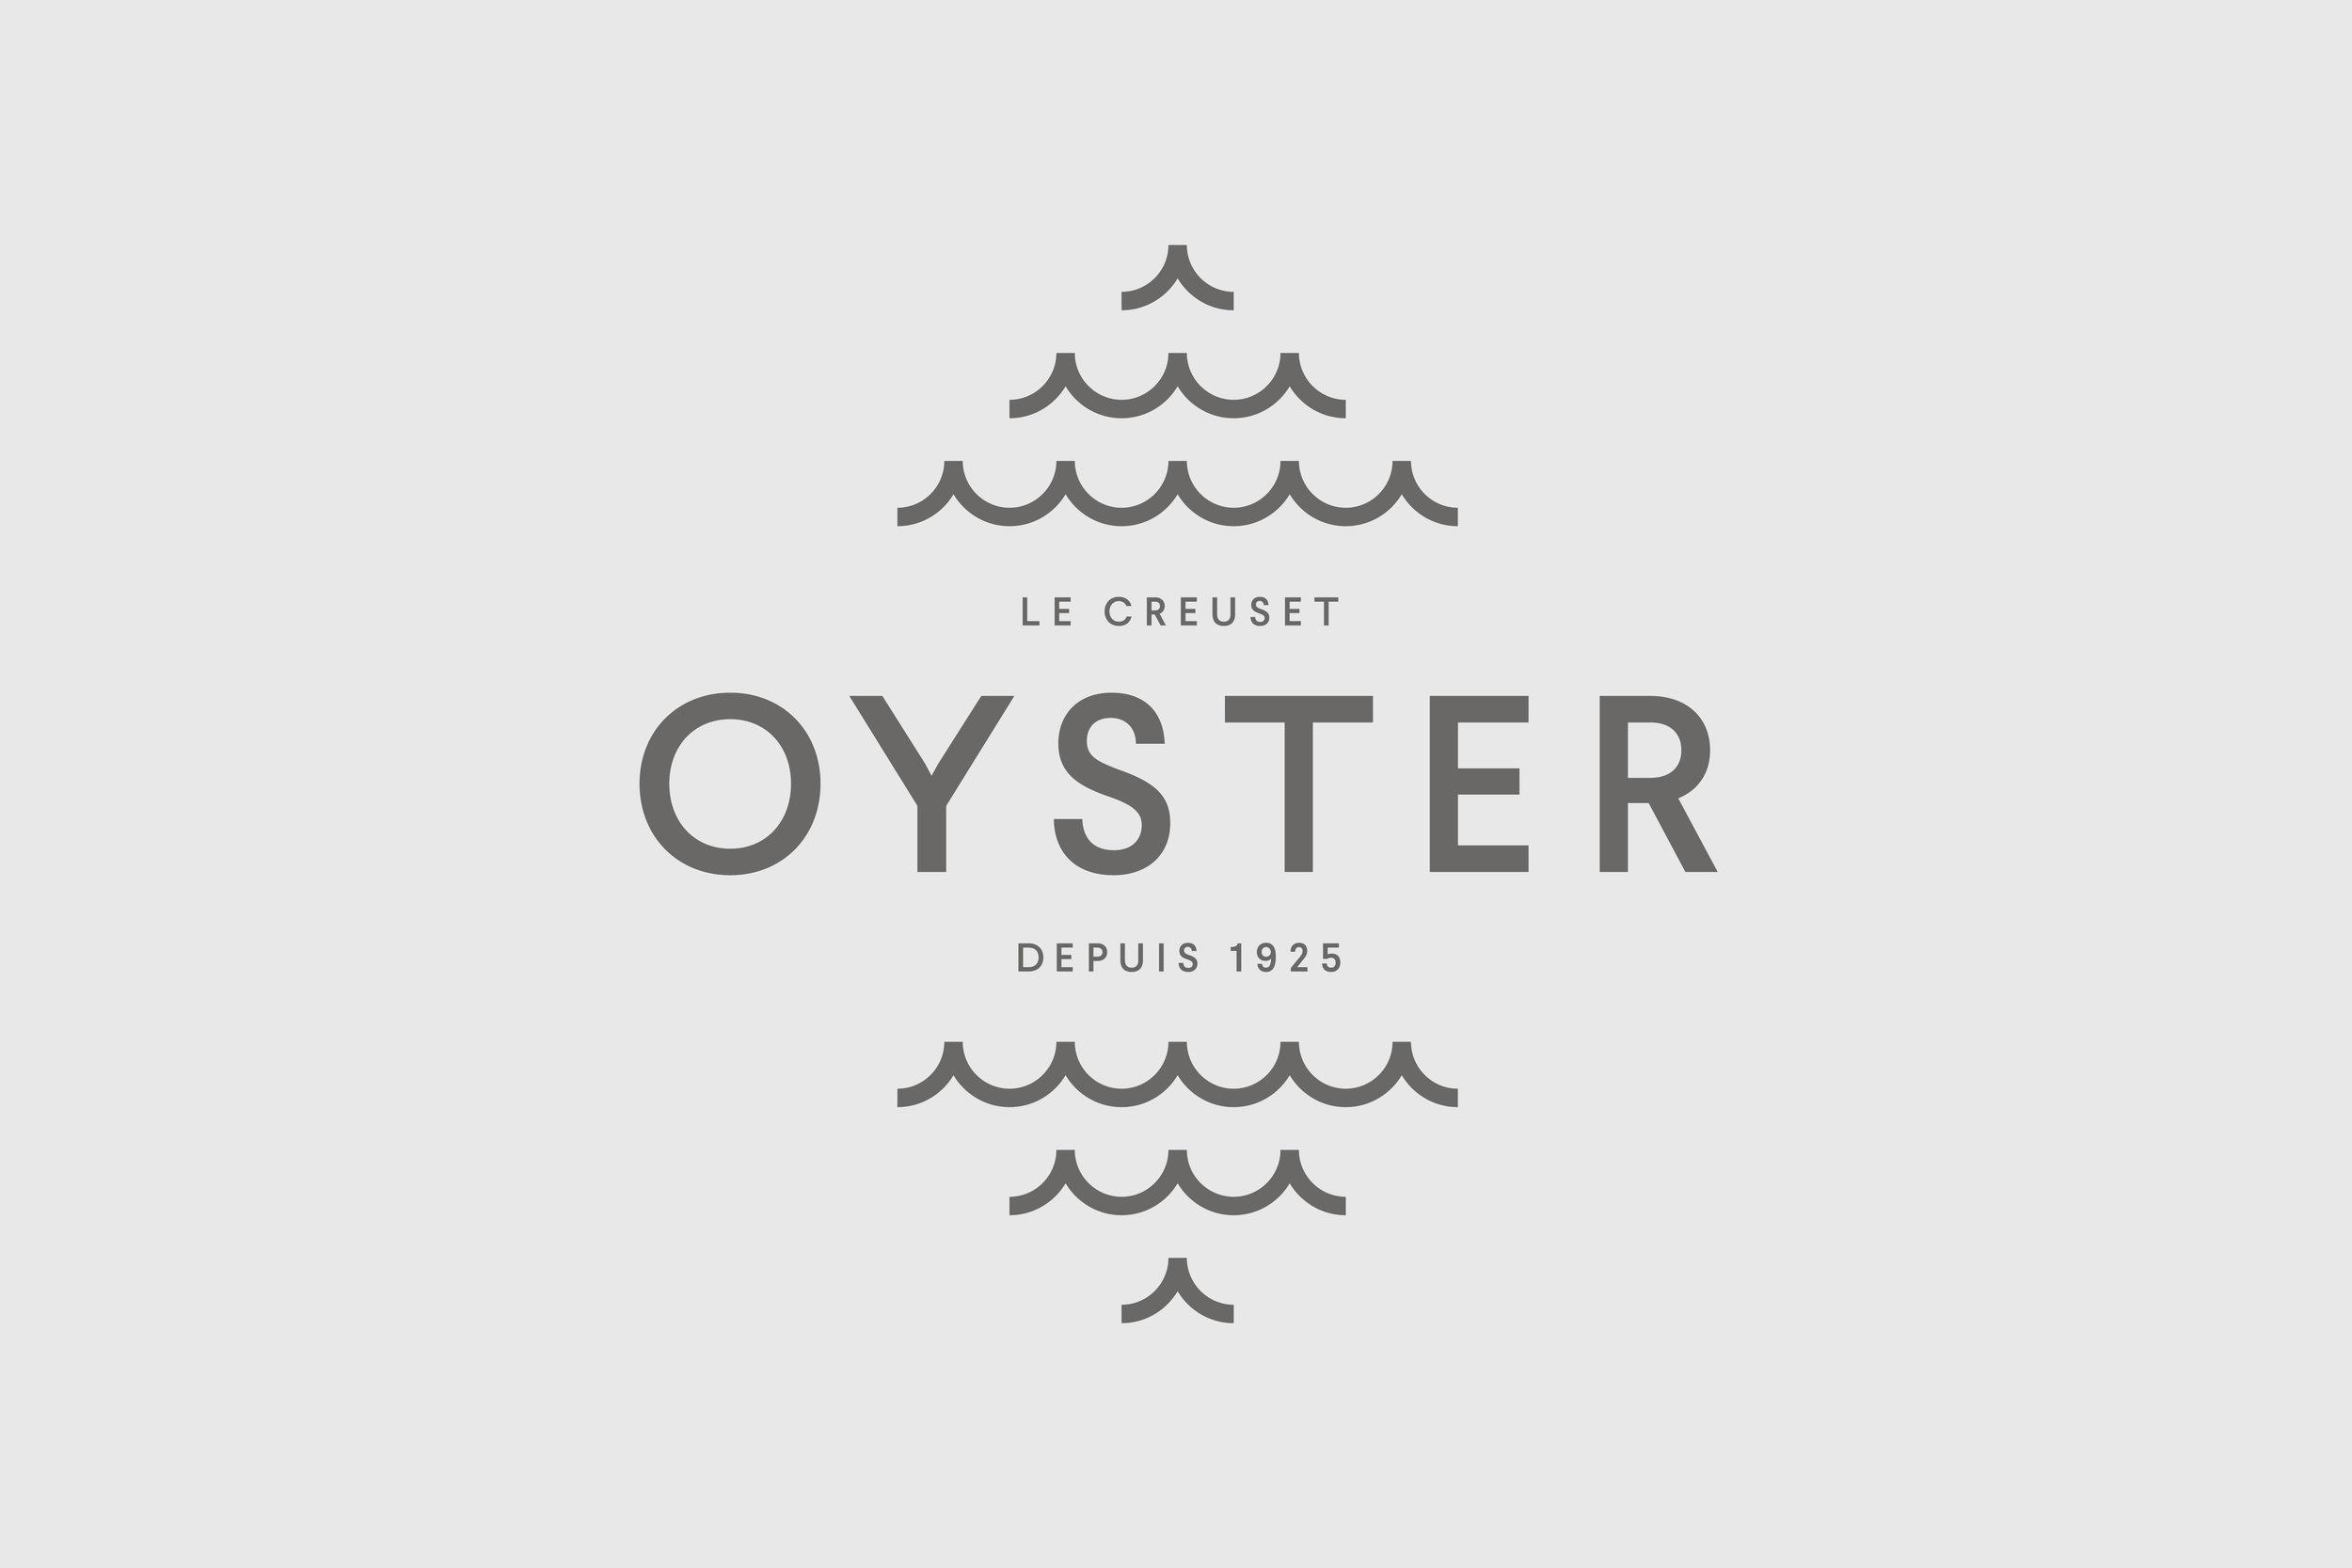 Oyster_01.jpg